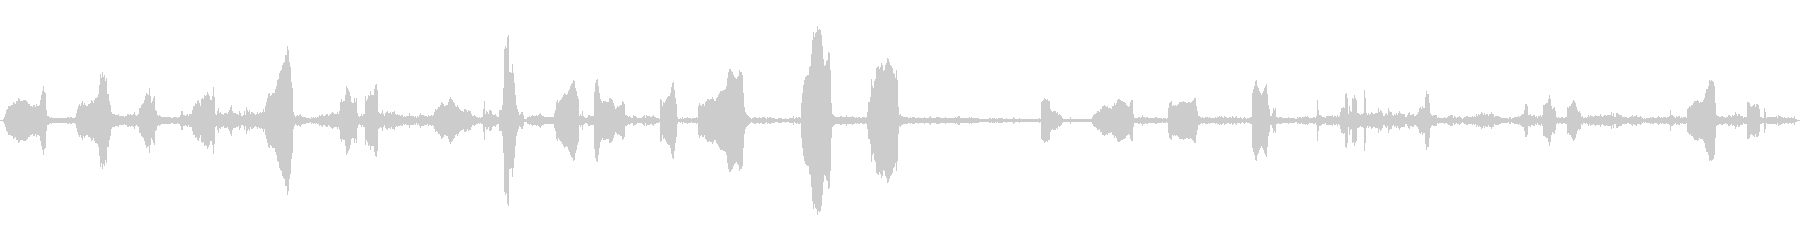 PANDA CUB、MEWING、...の未再生の波形